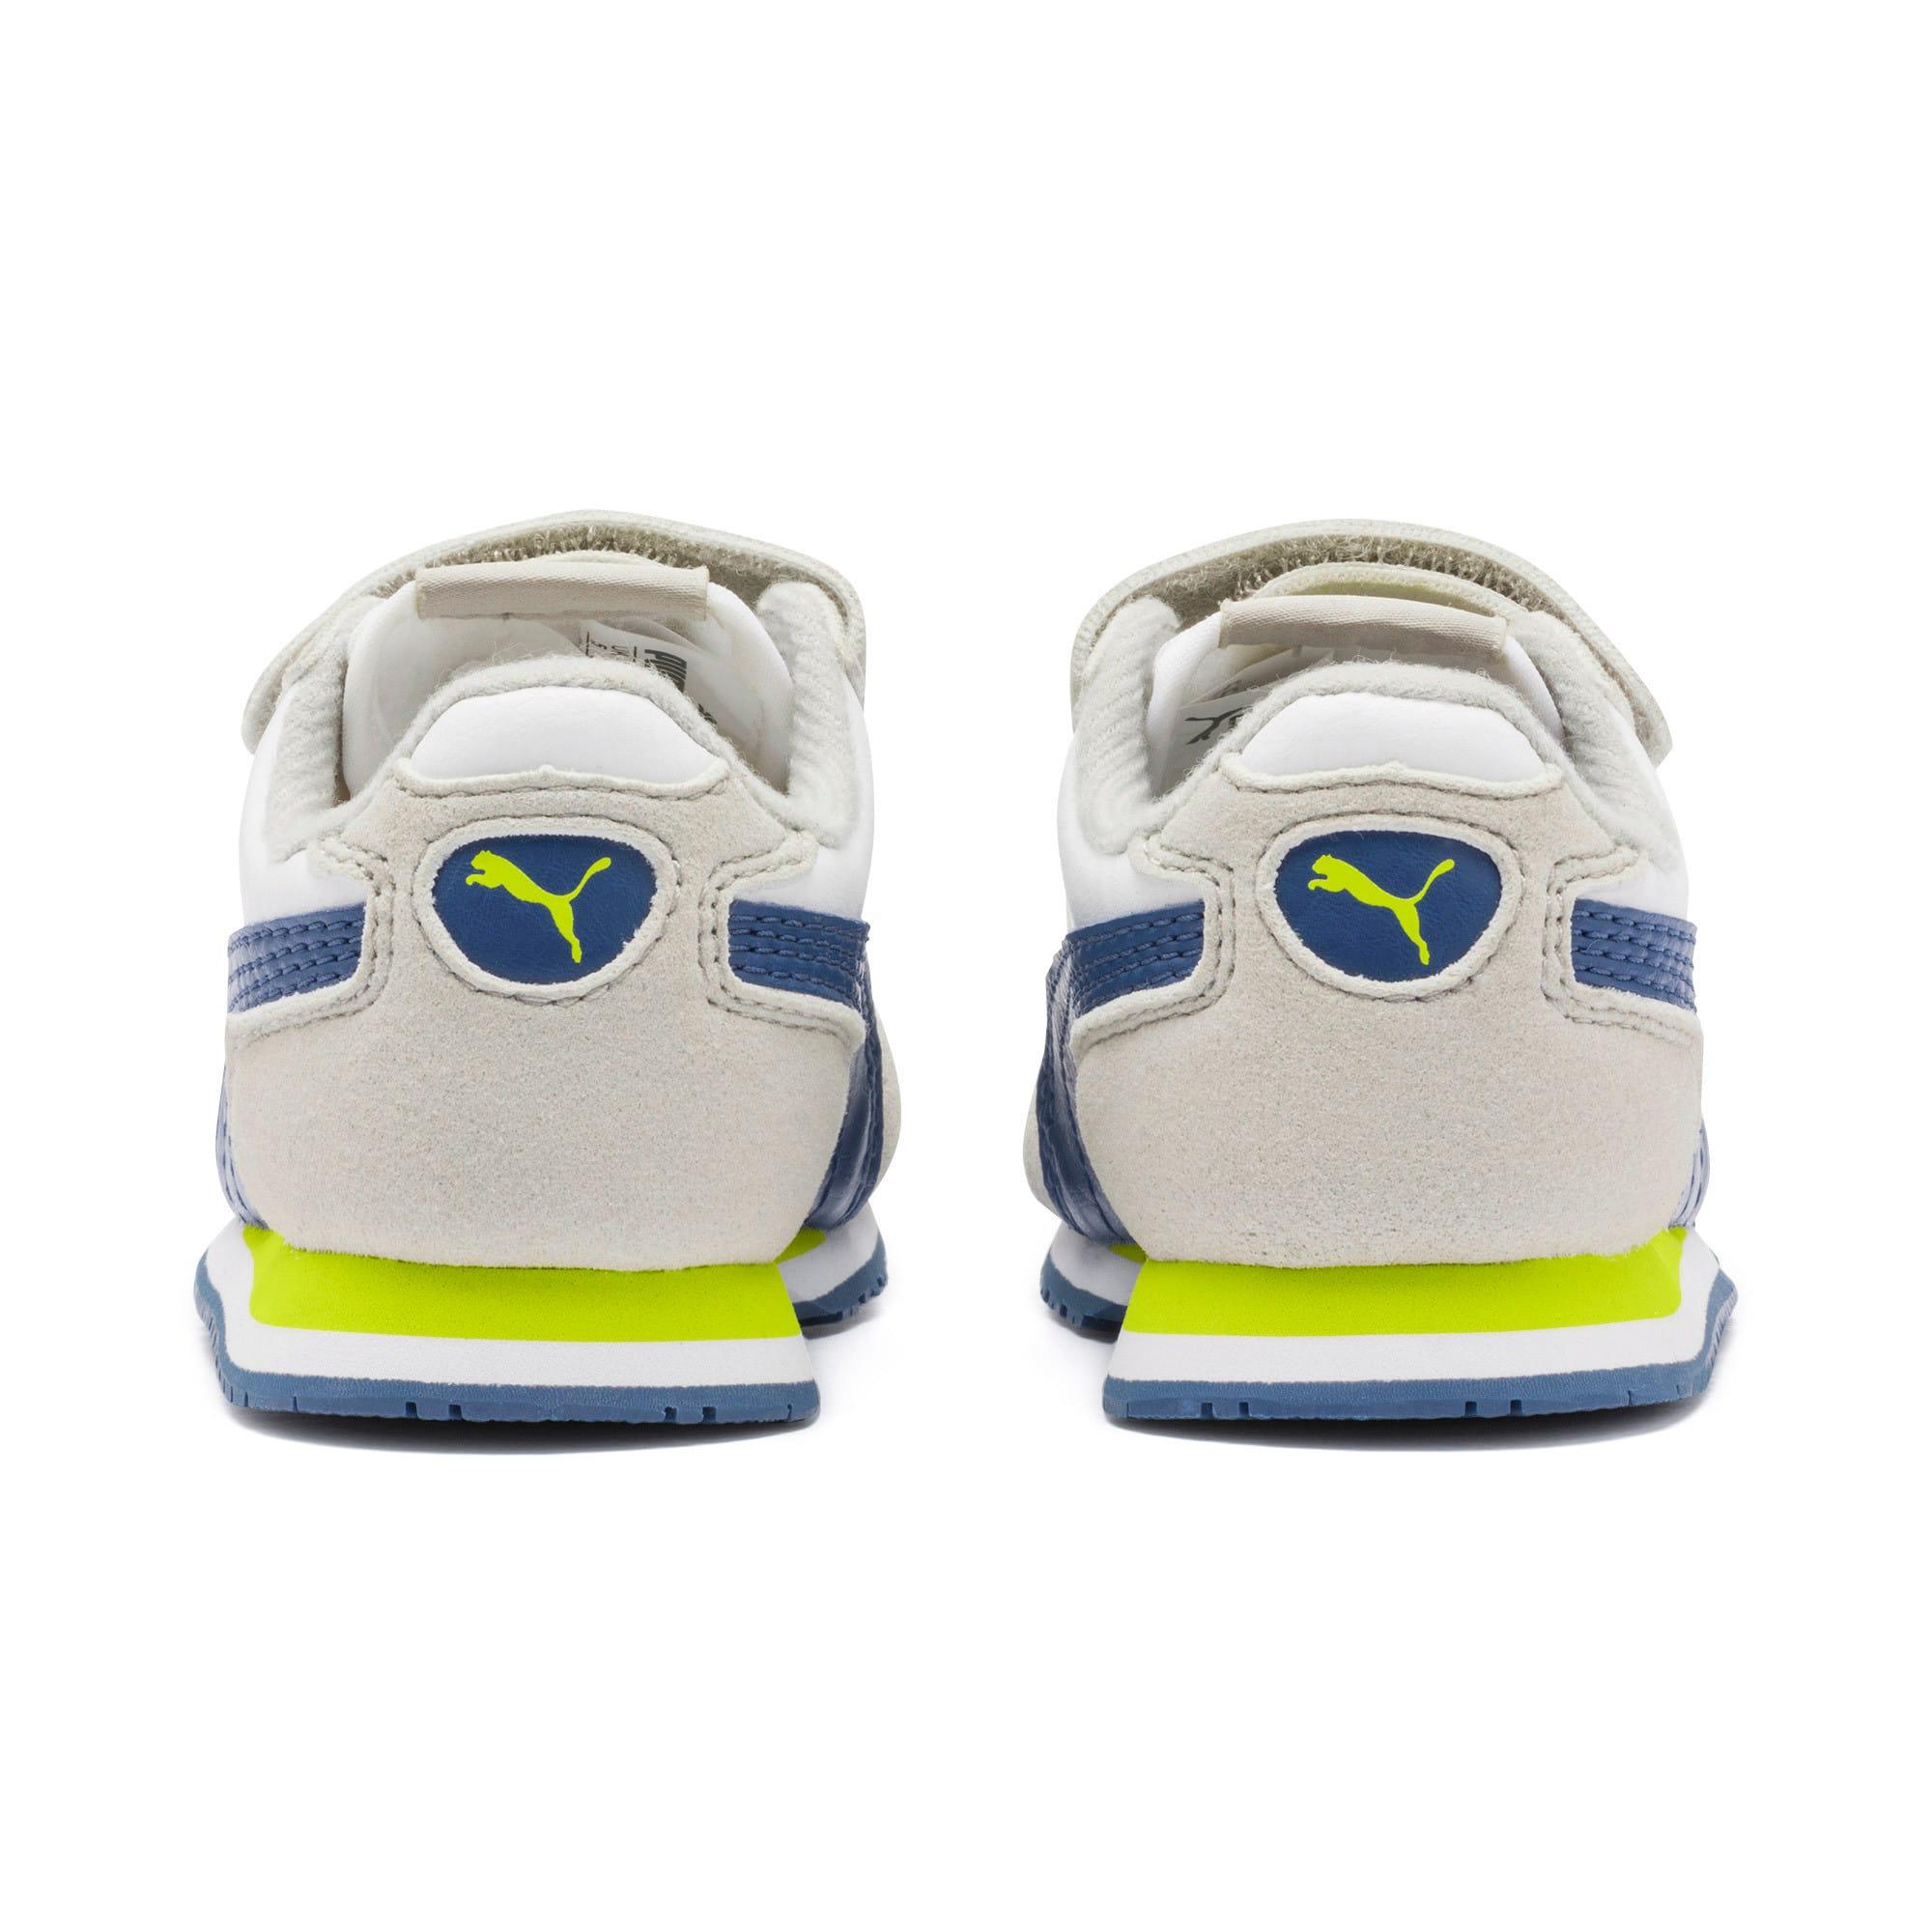 Thumbnail 3 of Cabana Racer SL Toddler Shoes, Puma White-Galaxy Blue, medium